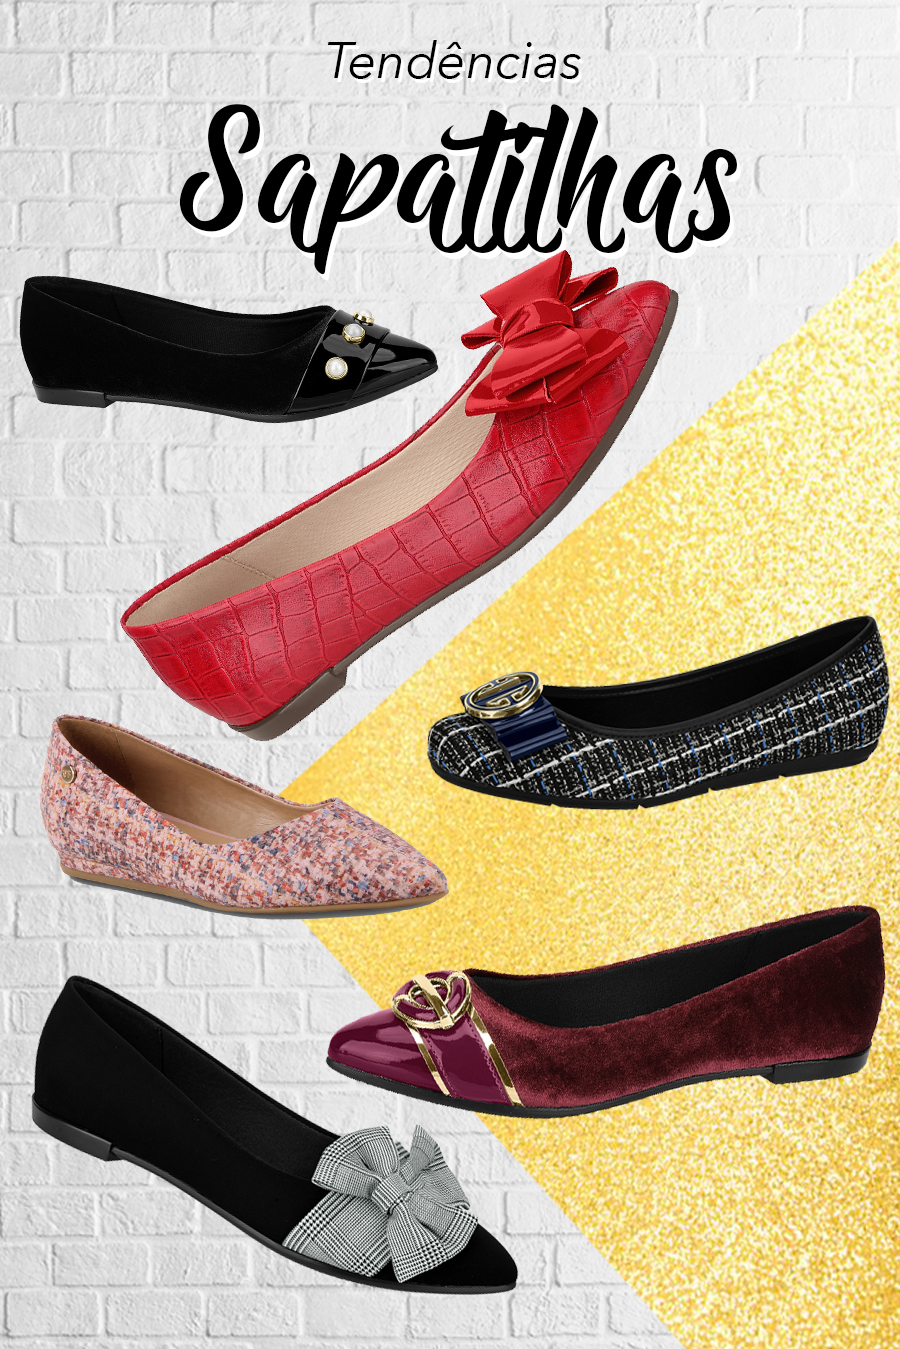 tendencias_sapatos_sapatilhas_inverno